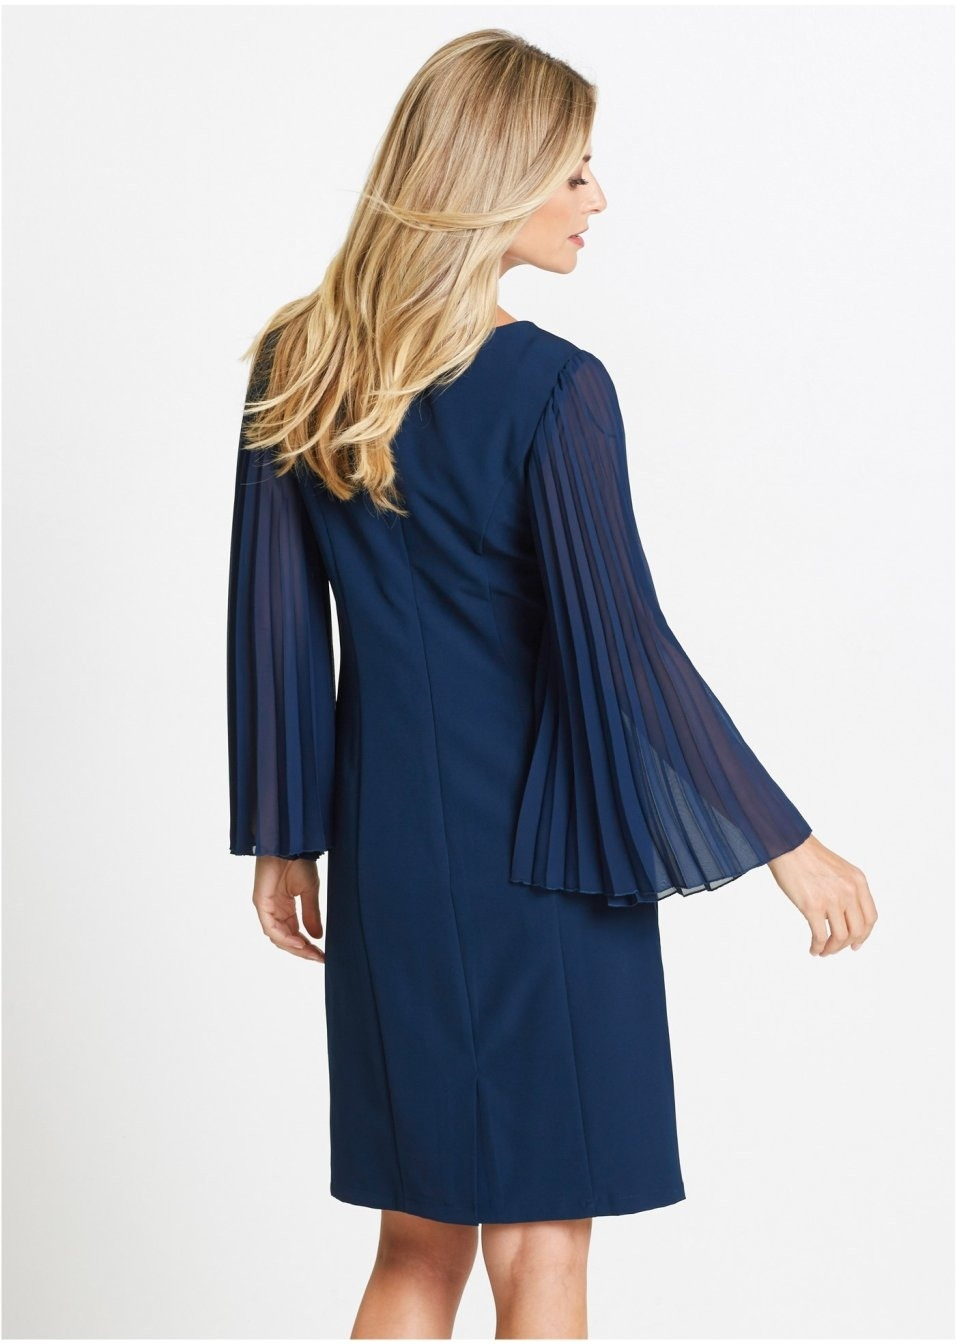 Designer Einzigartig Kleid Dunkelblau Langarm Vertrieb17 Perfekt Kleid Dunkelblau Langarm Spezialgebiet